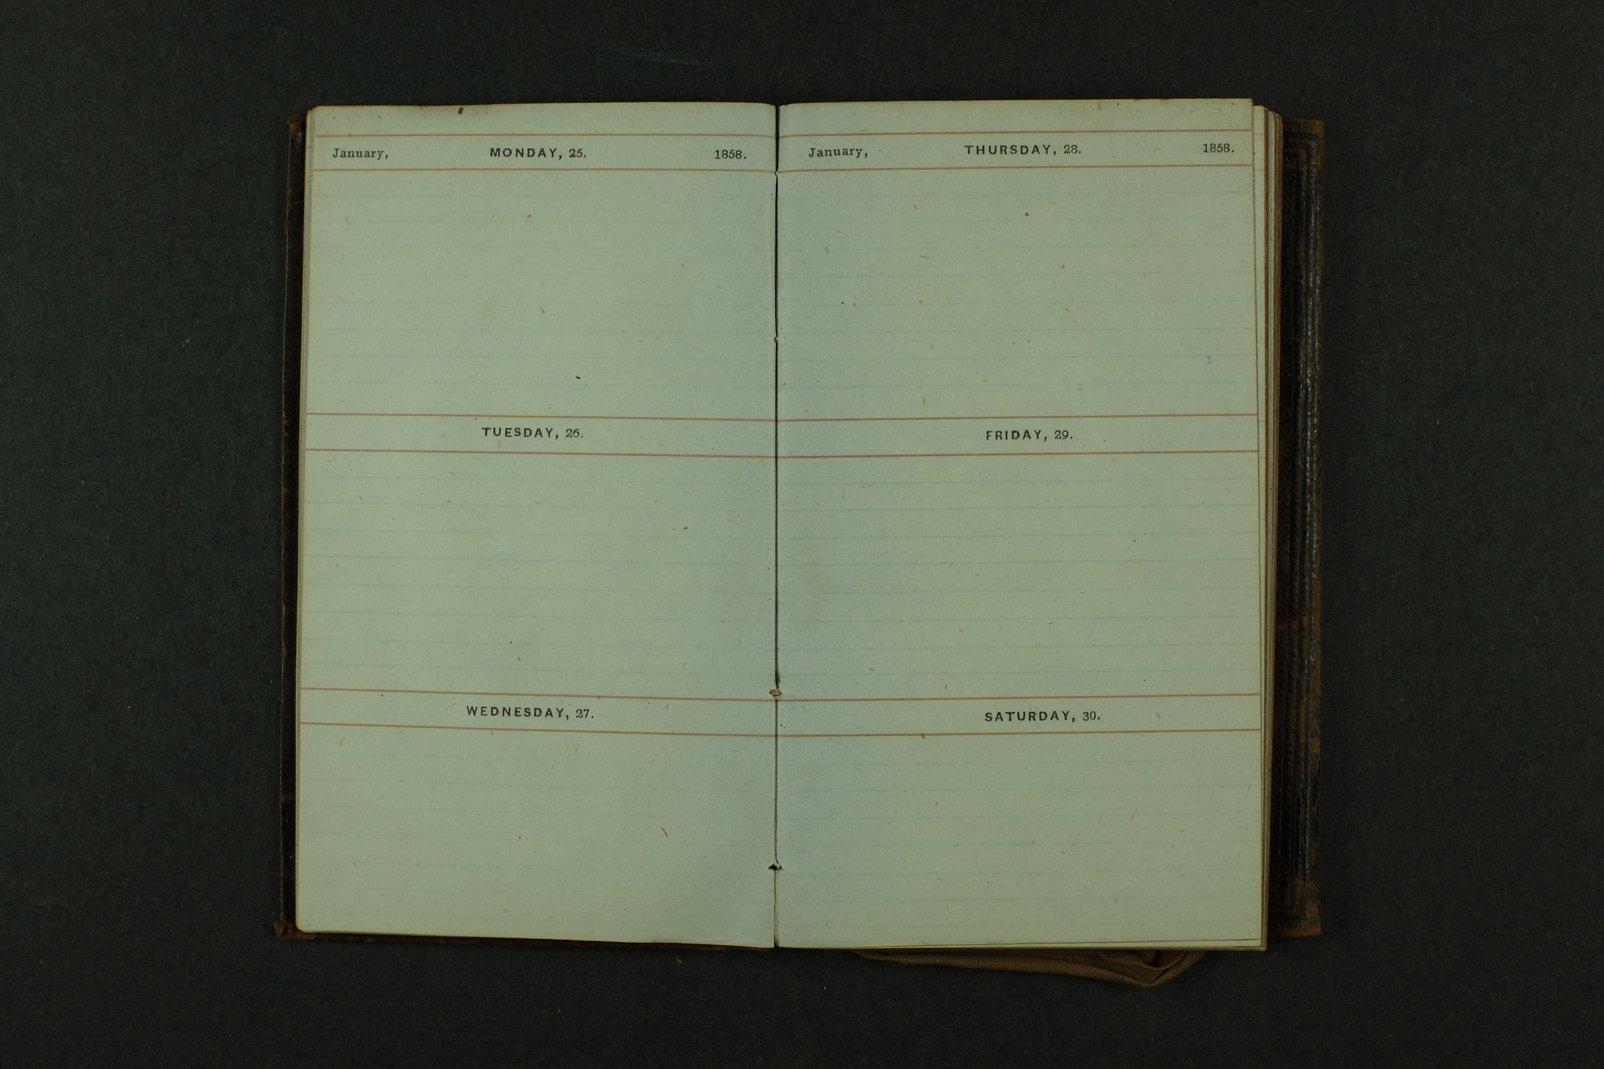 William E. Goodnow diary - 10